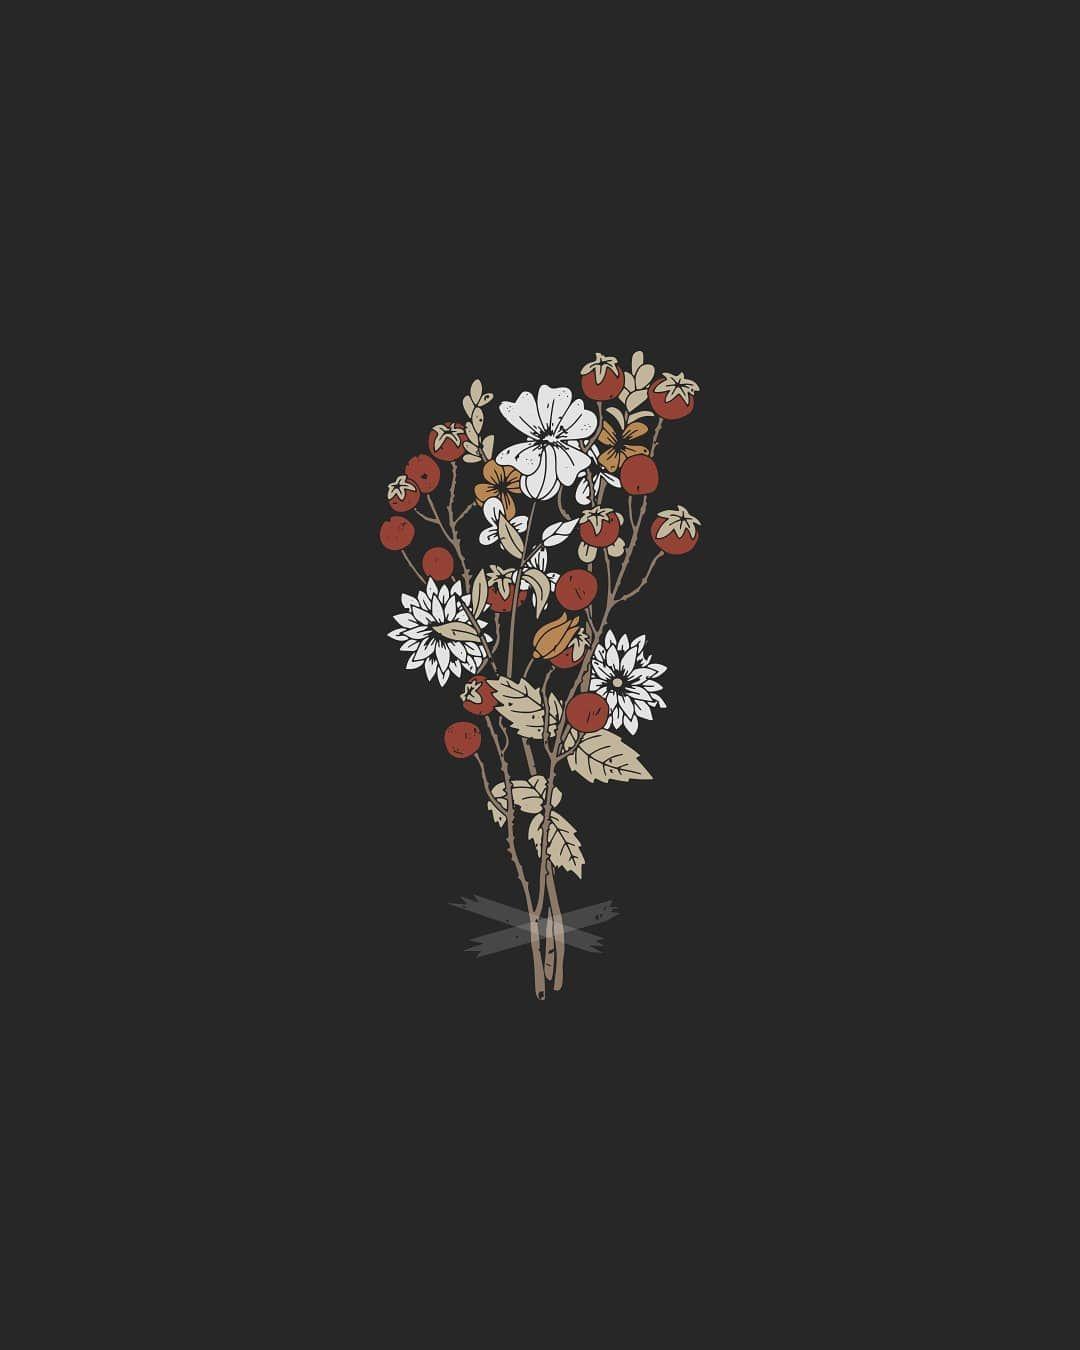 Flowers Grow Out Of Dark Moments Love Doodle Weedingday Instaart Flowerstagram Vintagefas Hipster Phone Wallpaper Minimalist Wallpaper Hipster Wallpaper